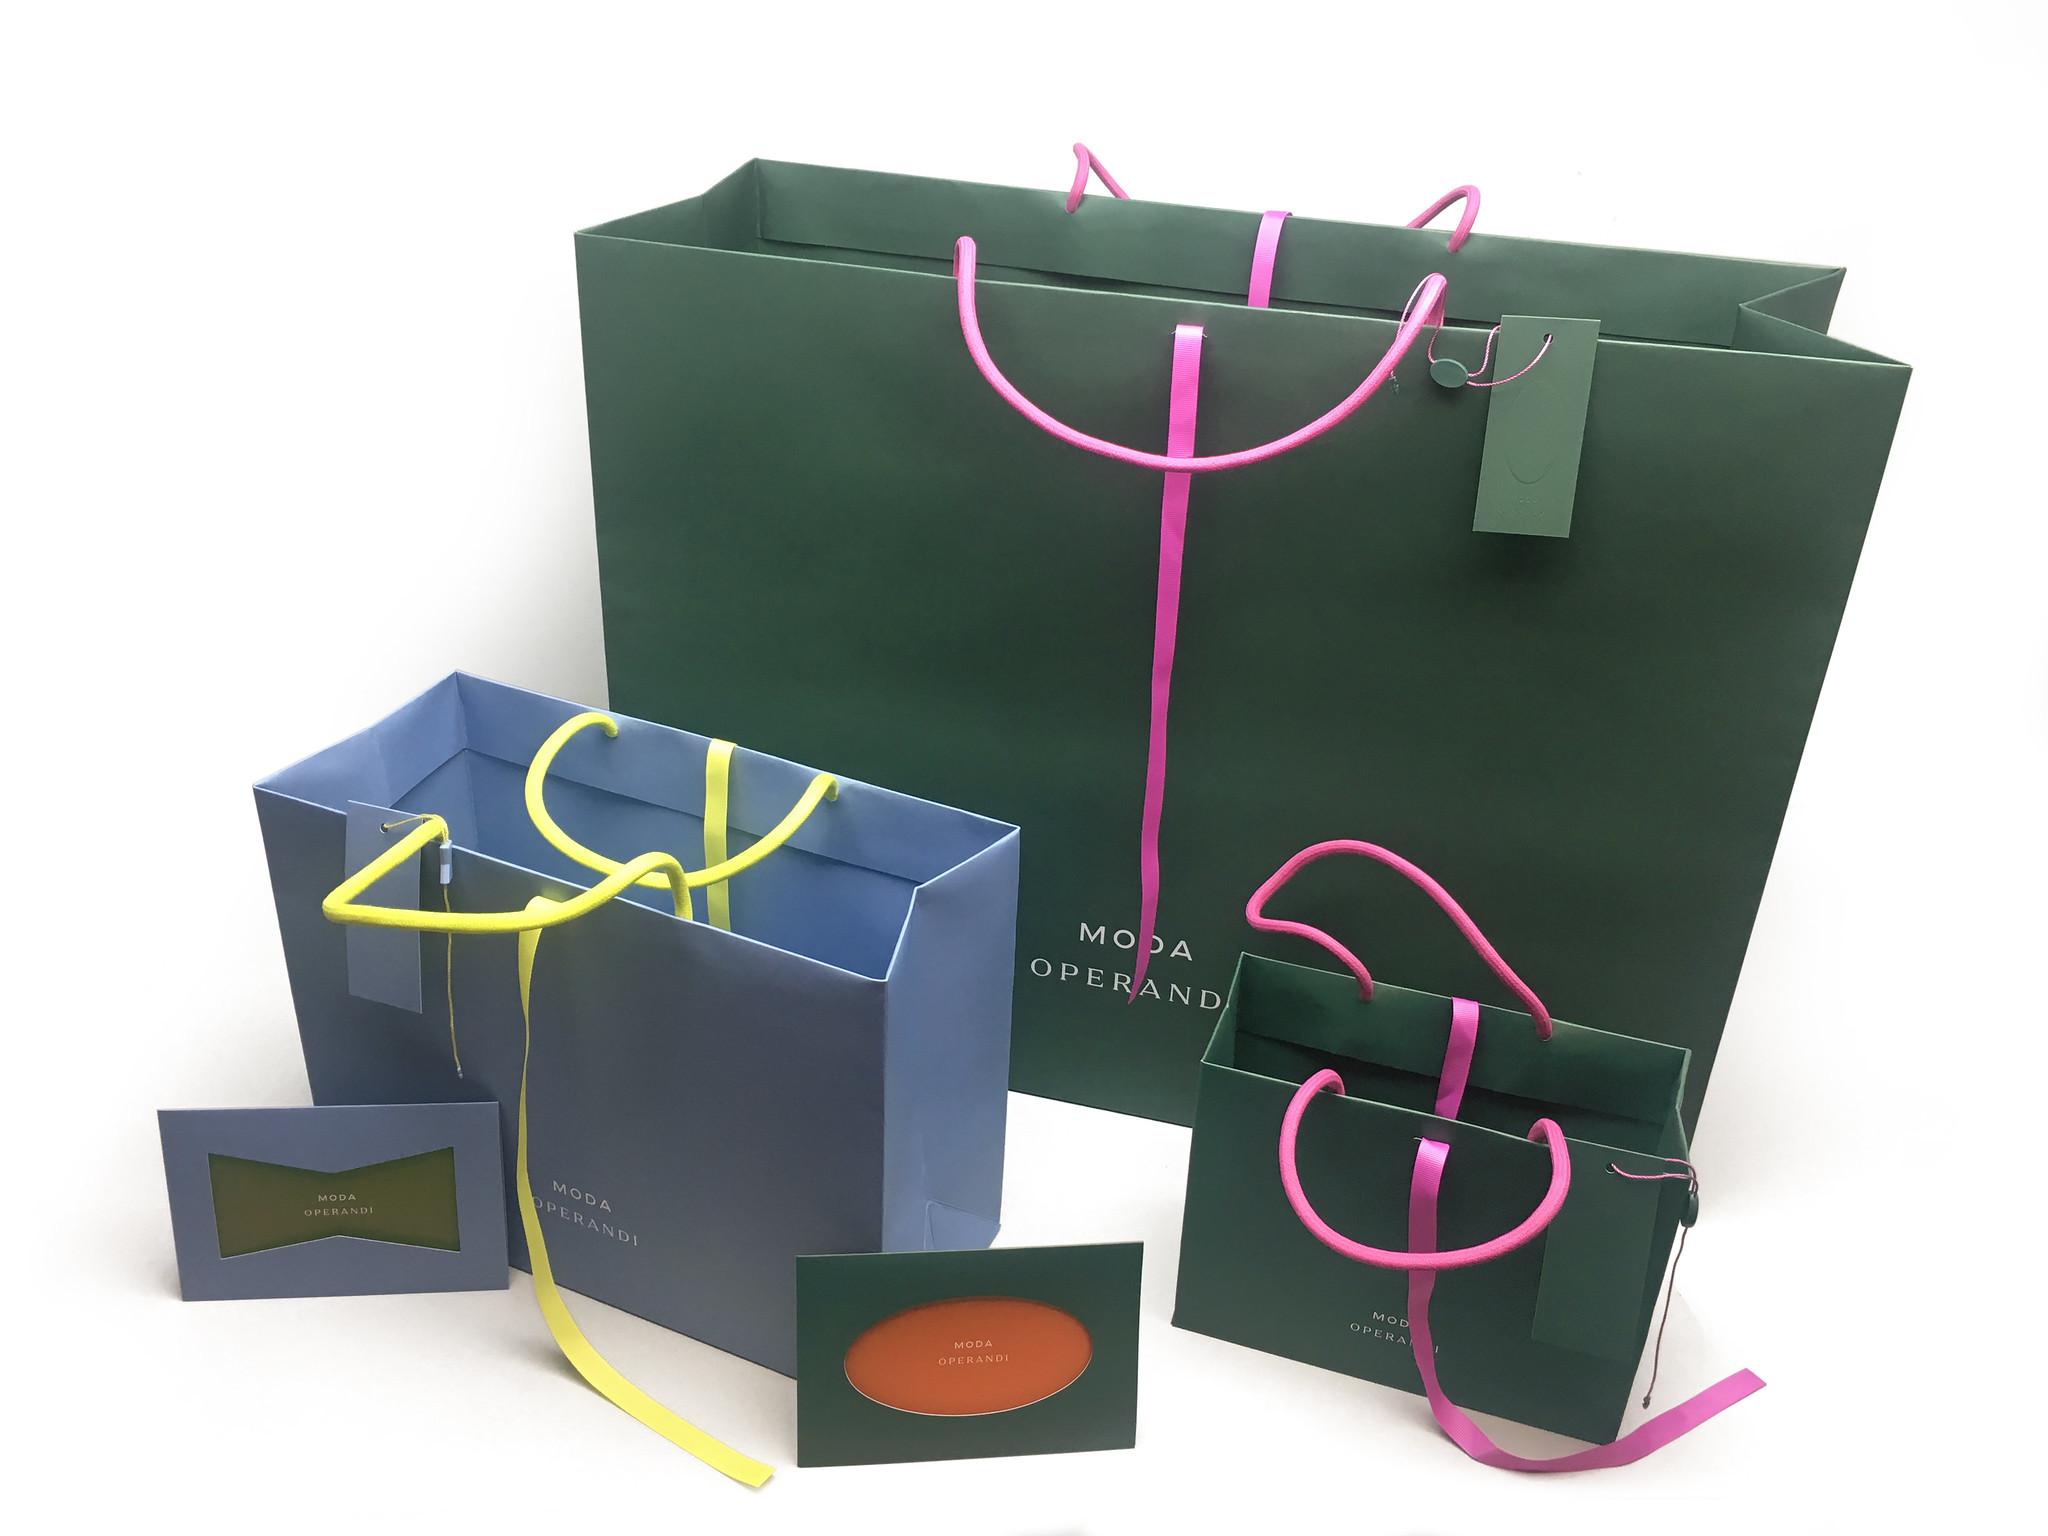 Custom Printed Retail Shopping Bags & Packaging: Moda Operandi